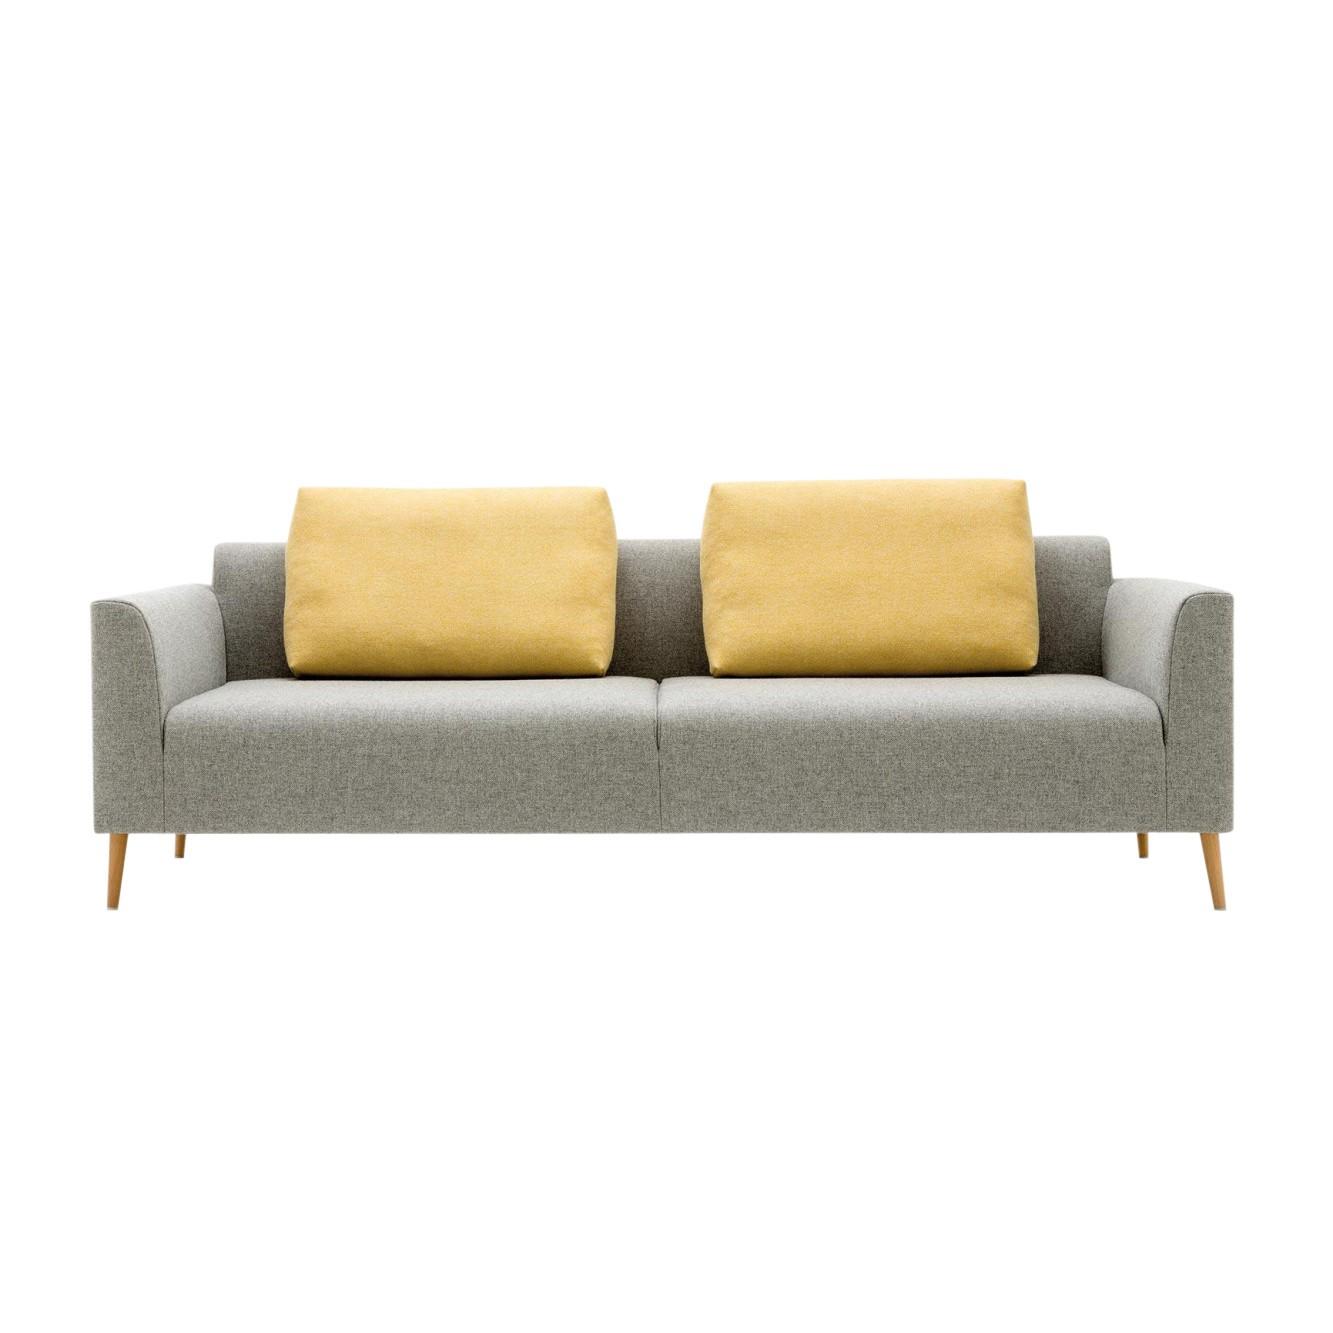 Freistil 162 3 Sitzer Sofa